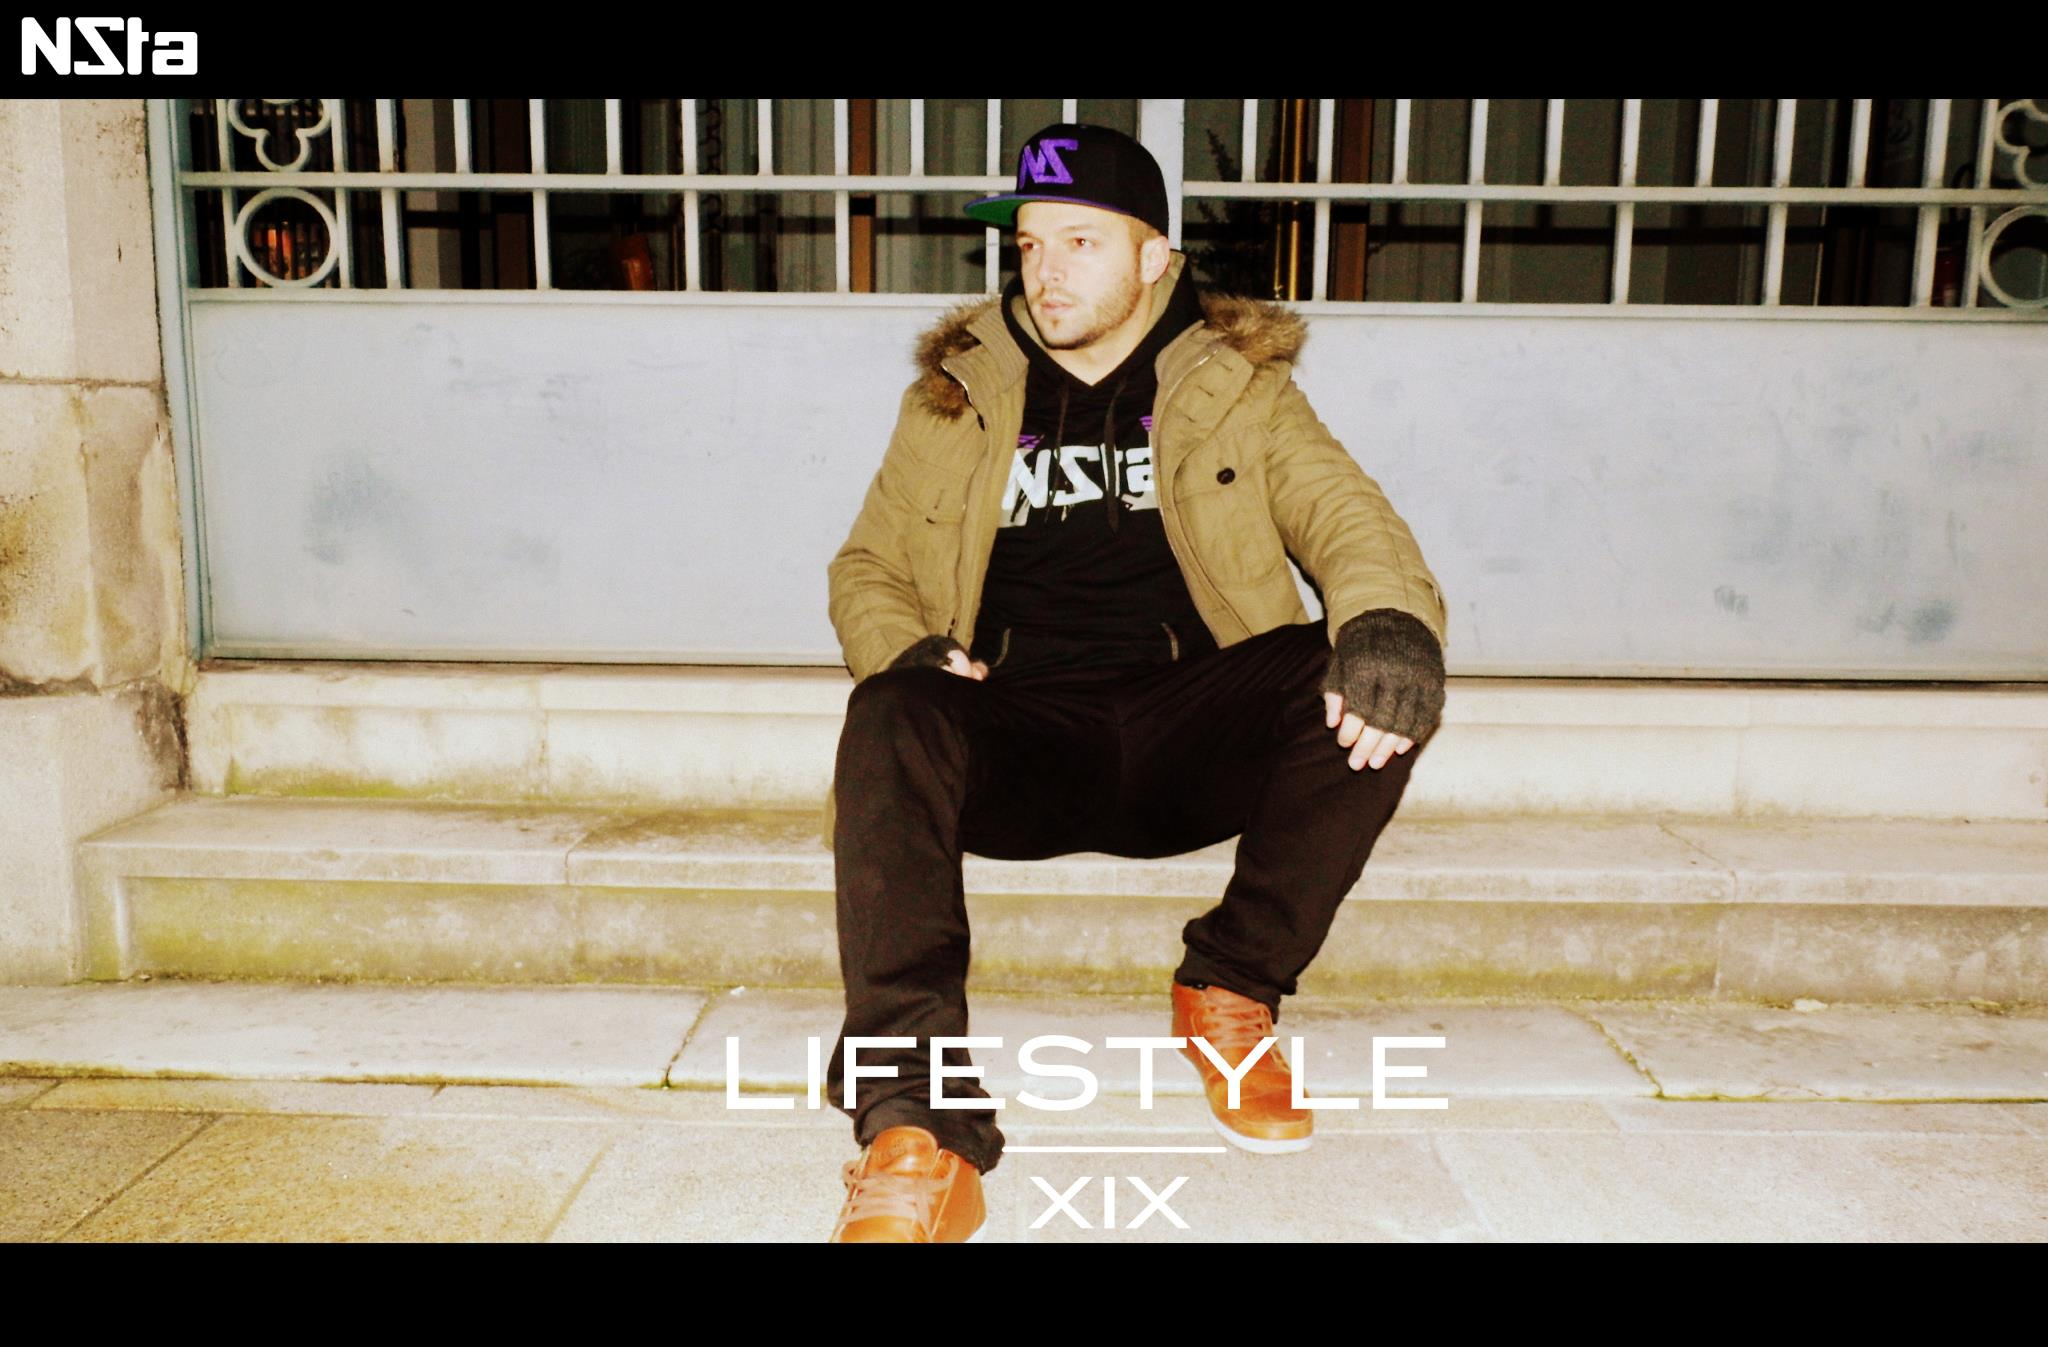 nsta lifestyle